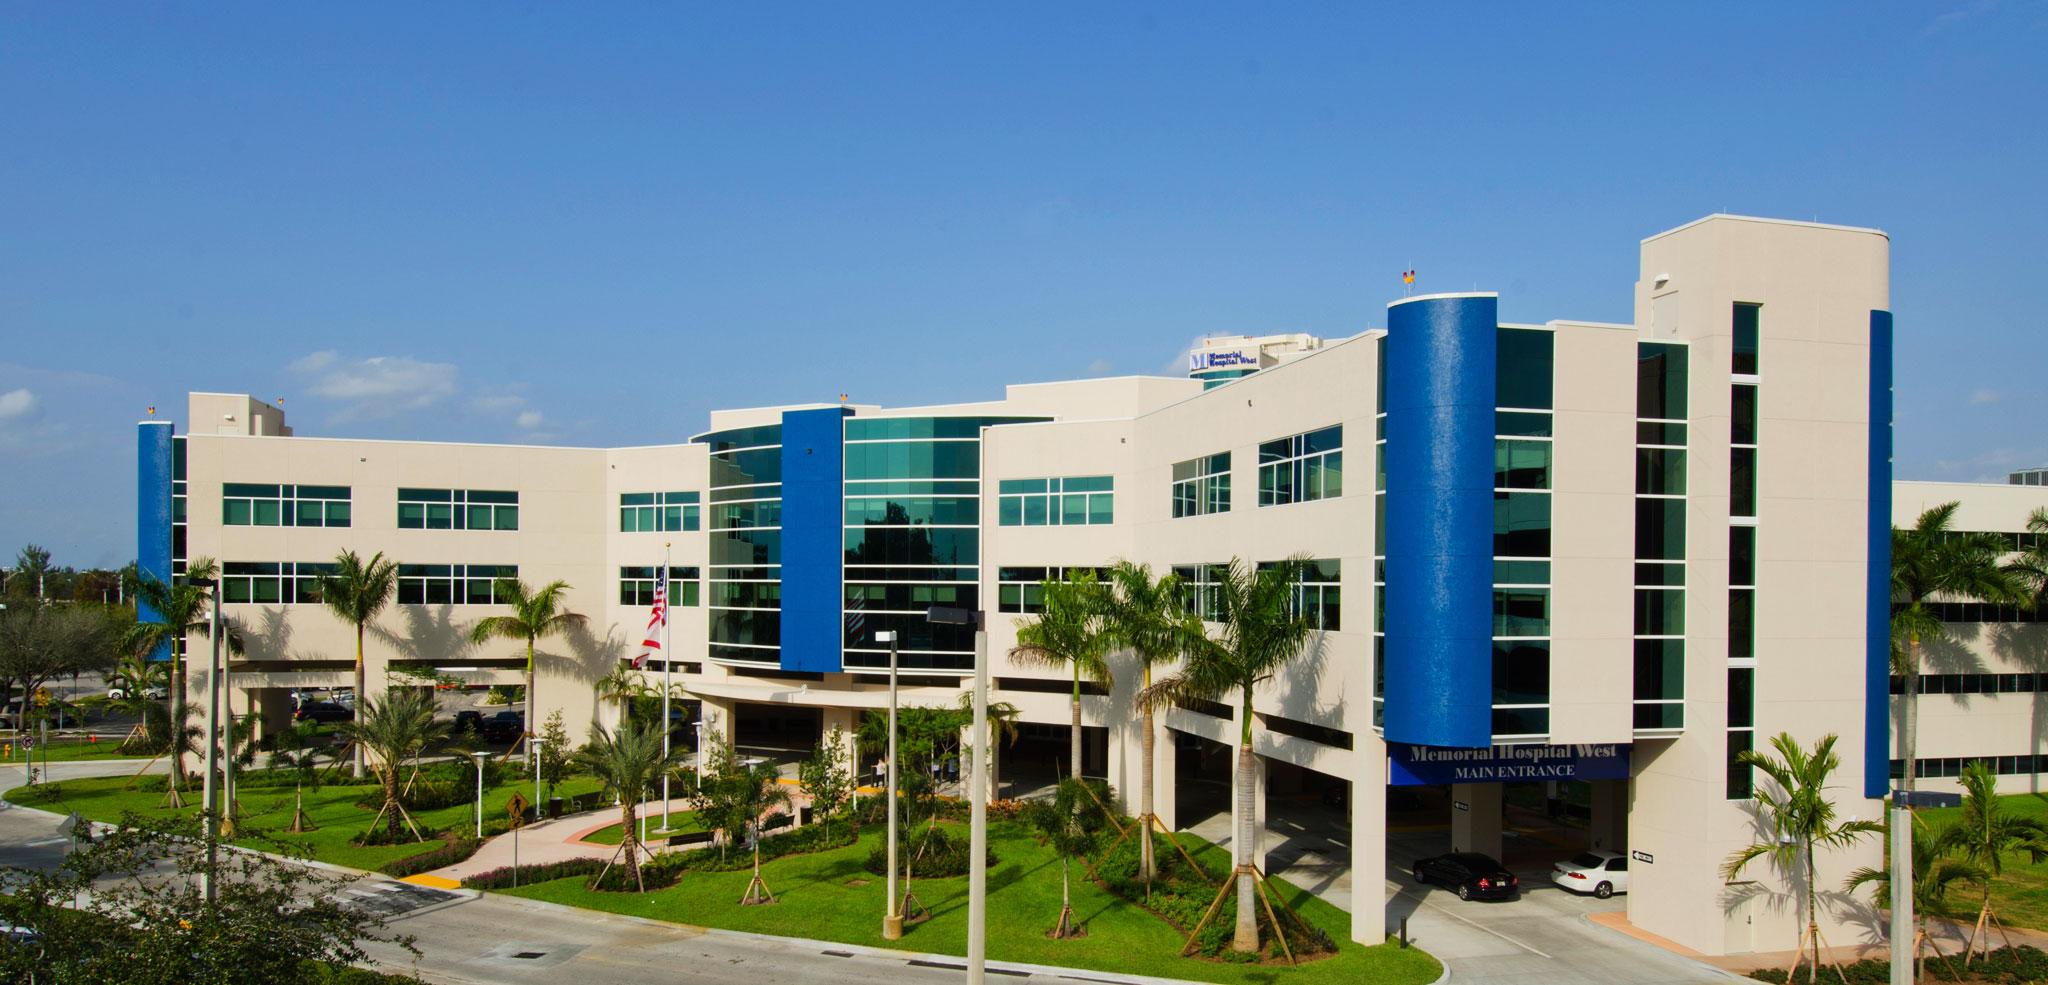 Memorial-Hospital-West